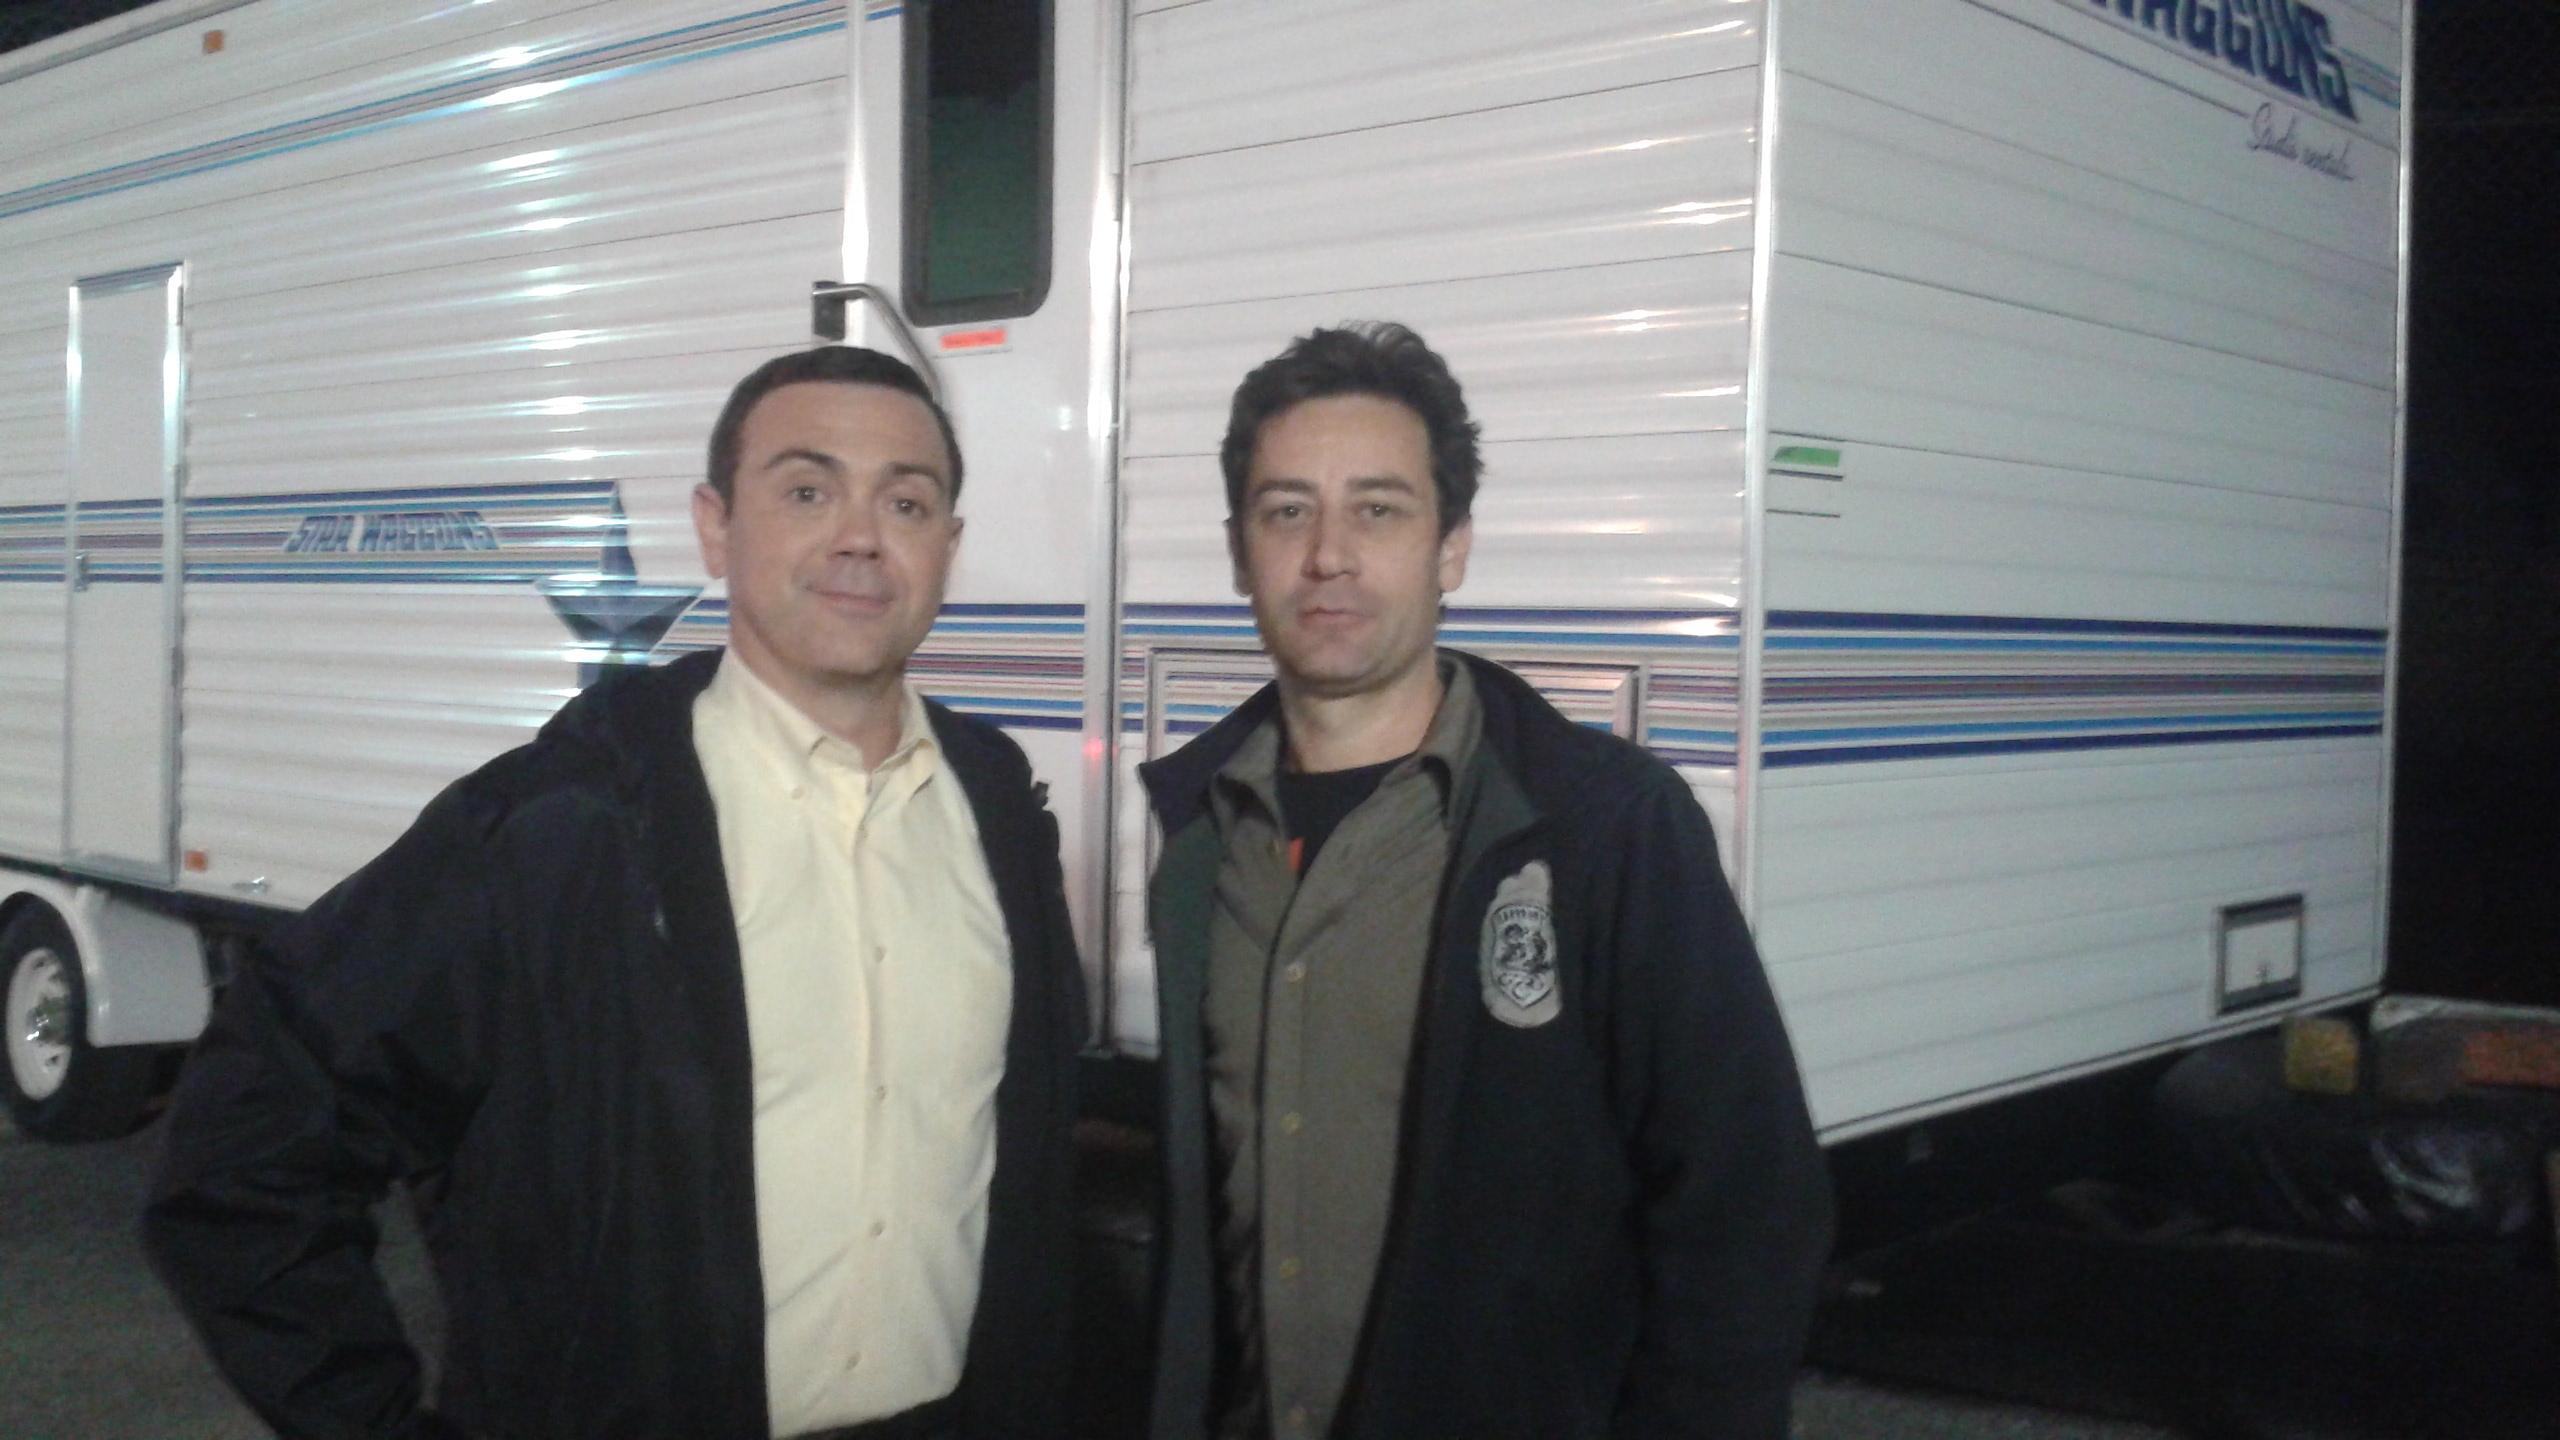 Scott V. with Joe Lo Truglio on Brooklyn Nine-Nine